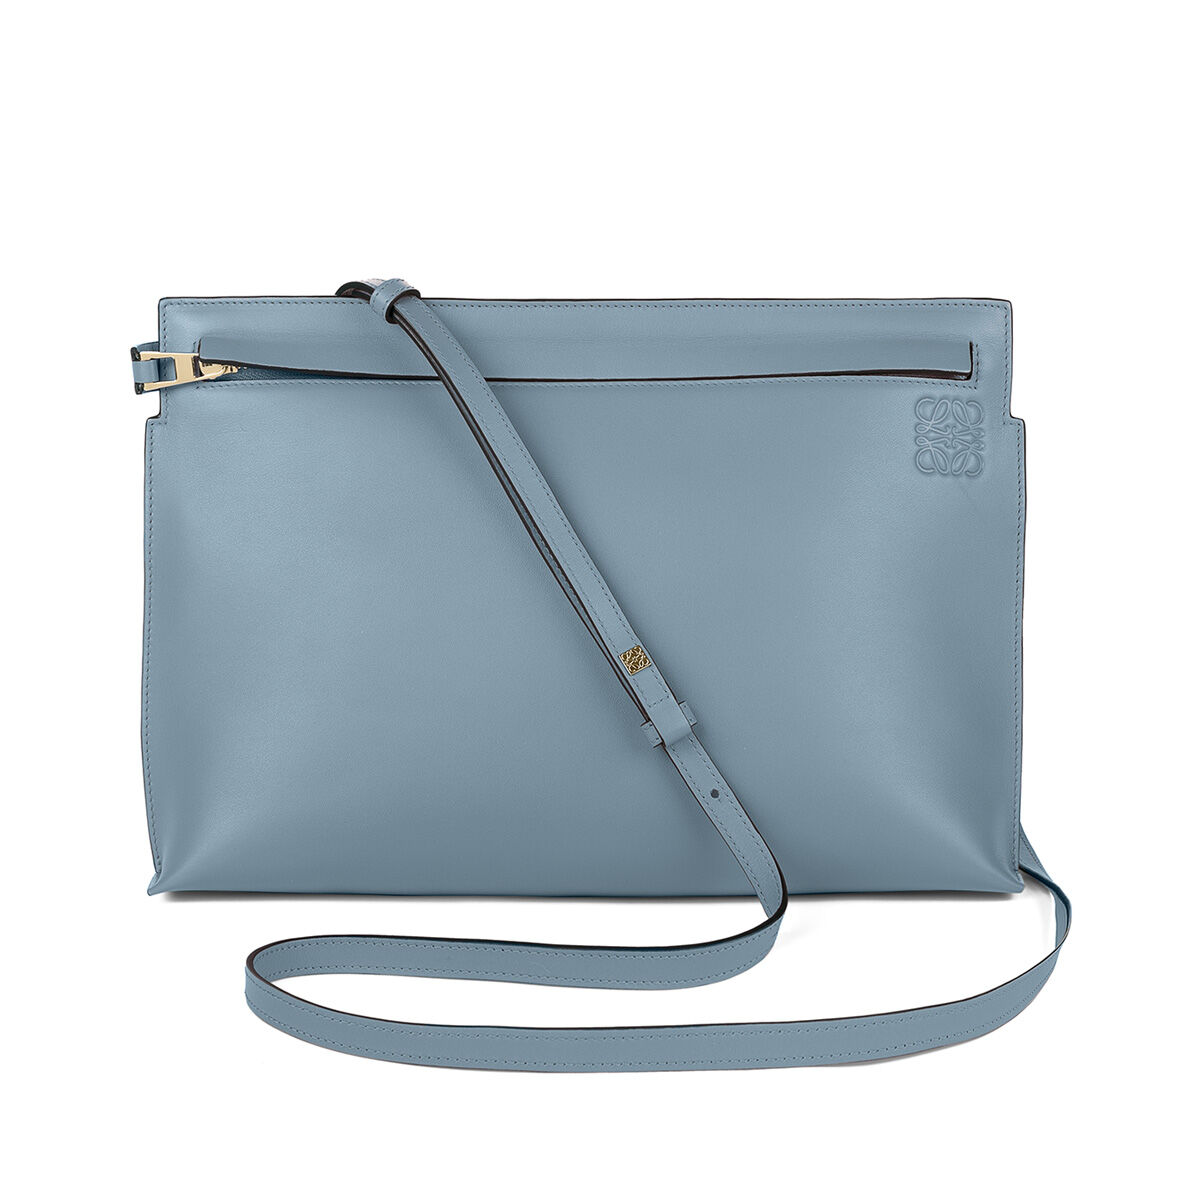 LOEWE T Pouch Bag 灰蓝色 all